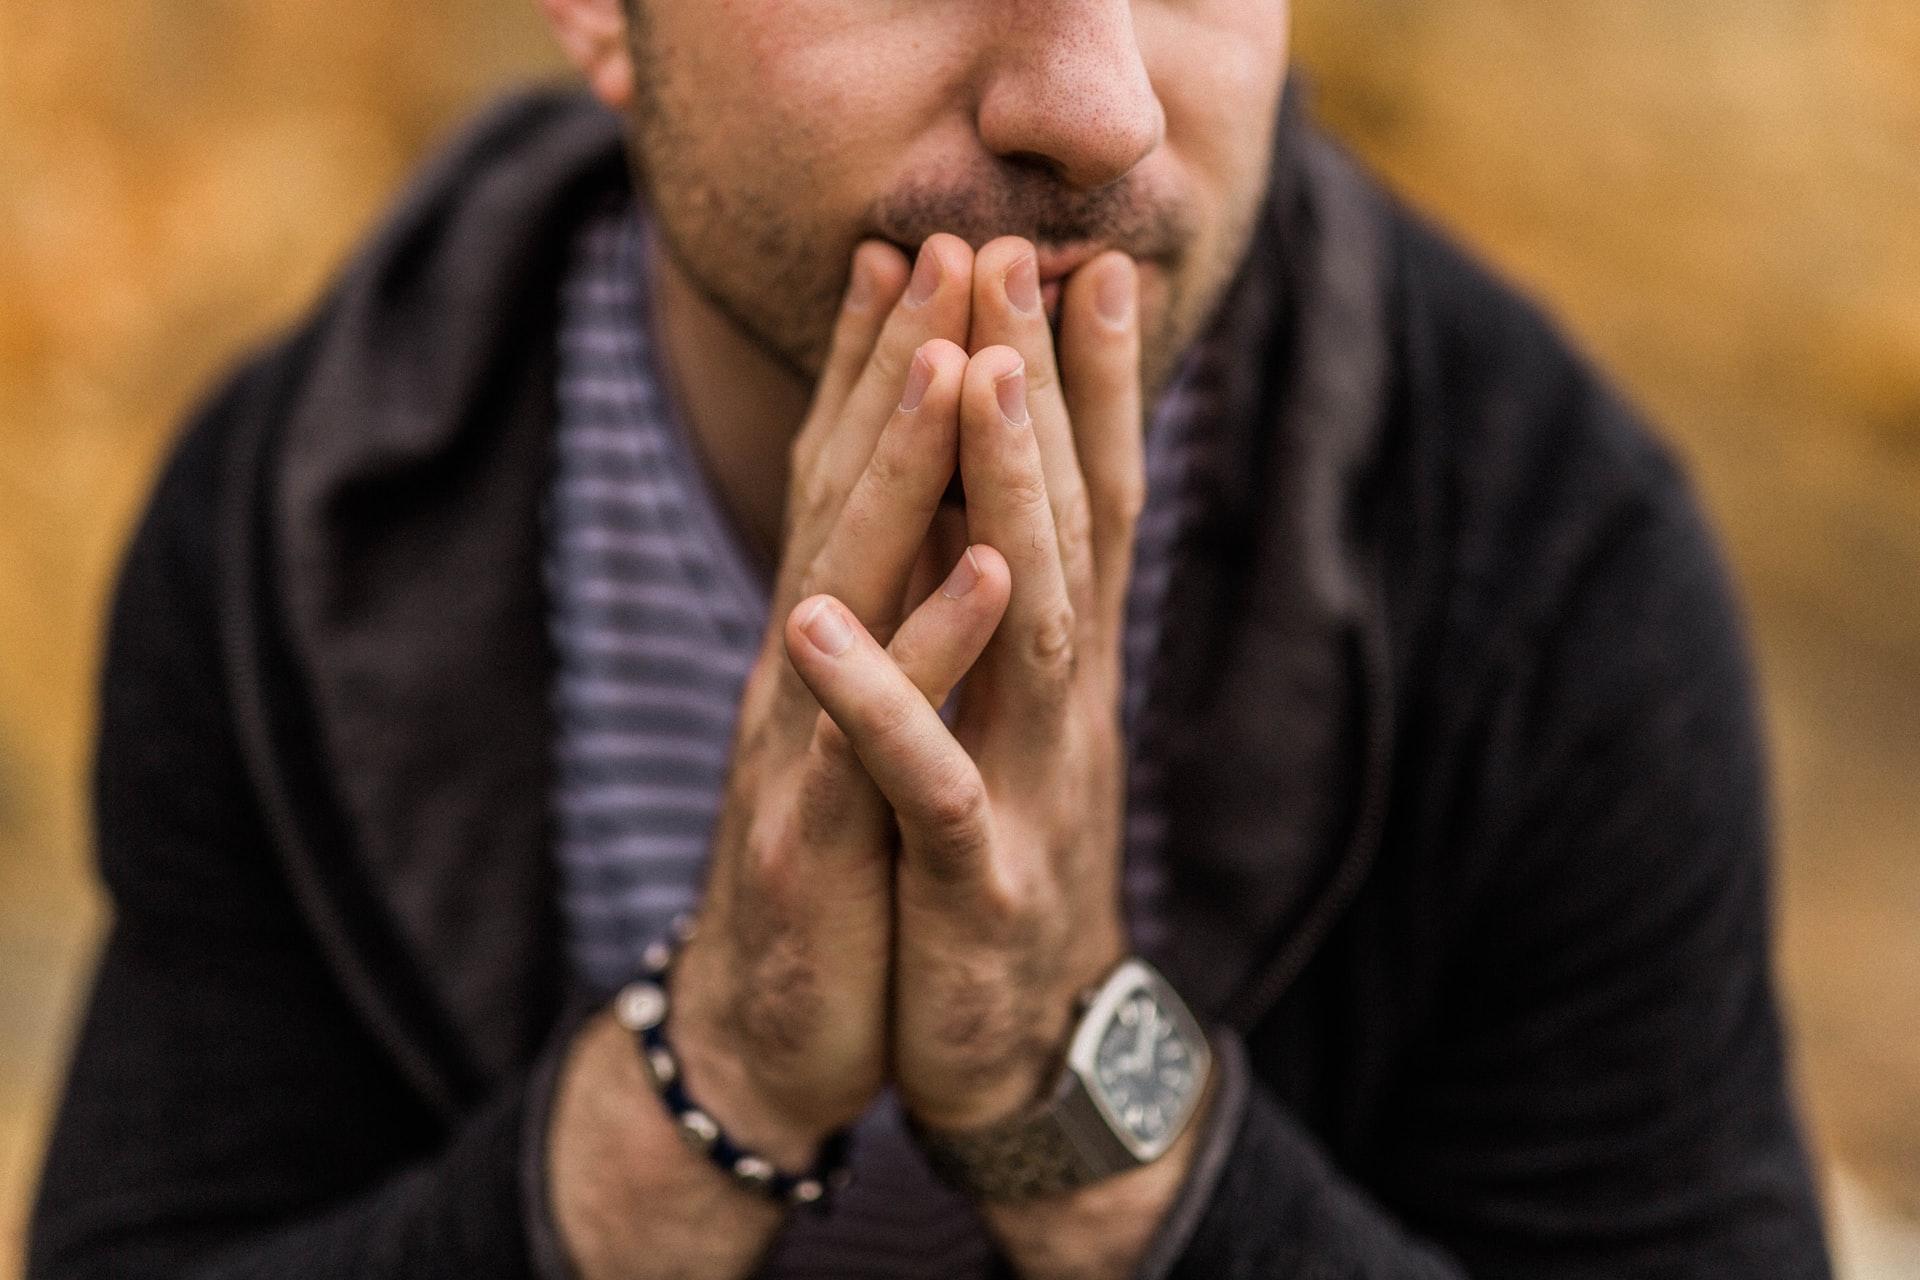 Mental Health: How Do Each of Us Help Reduce Violence?